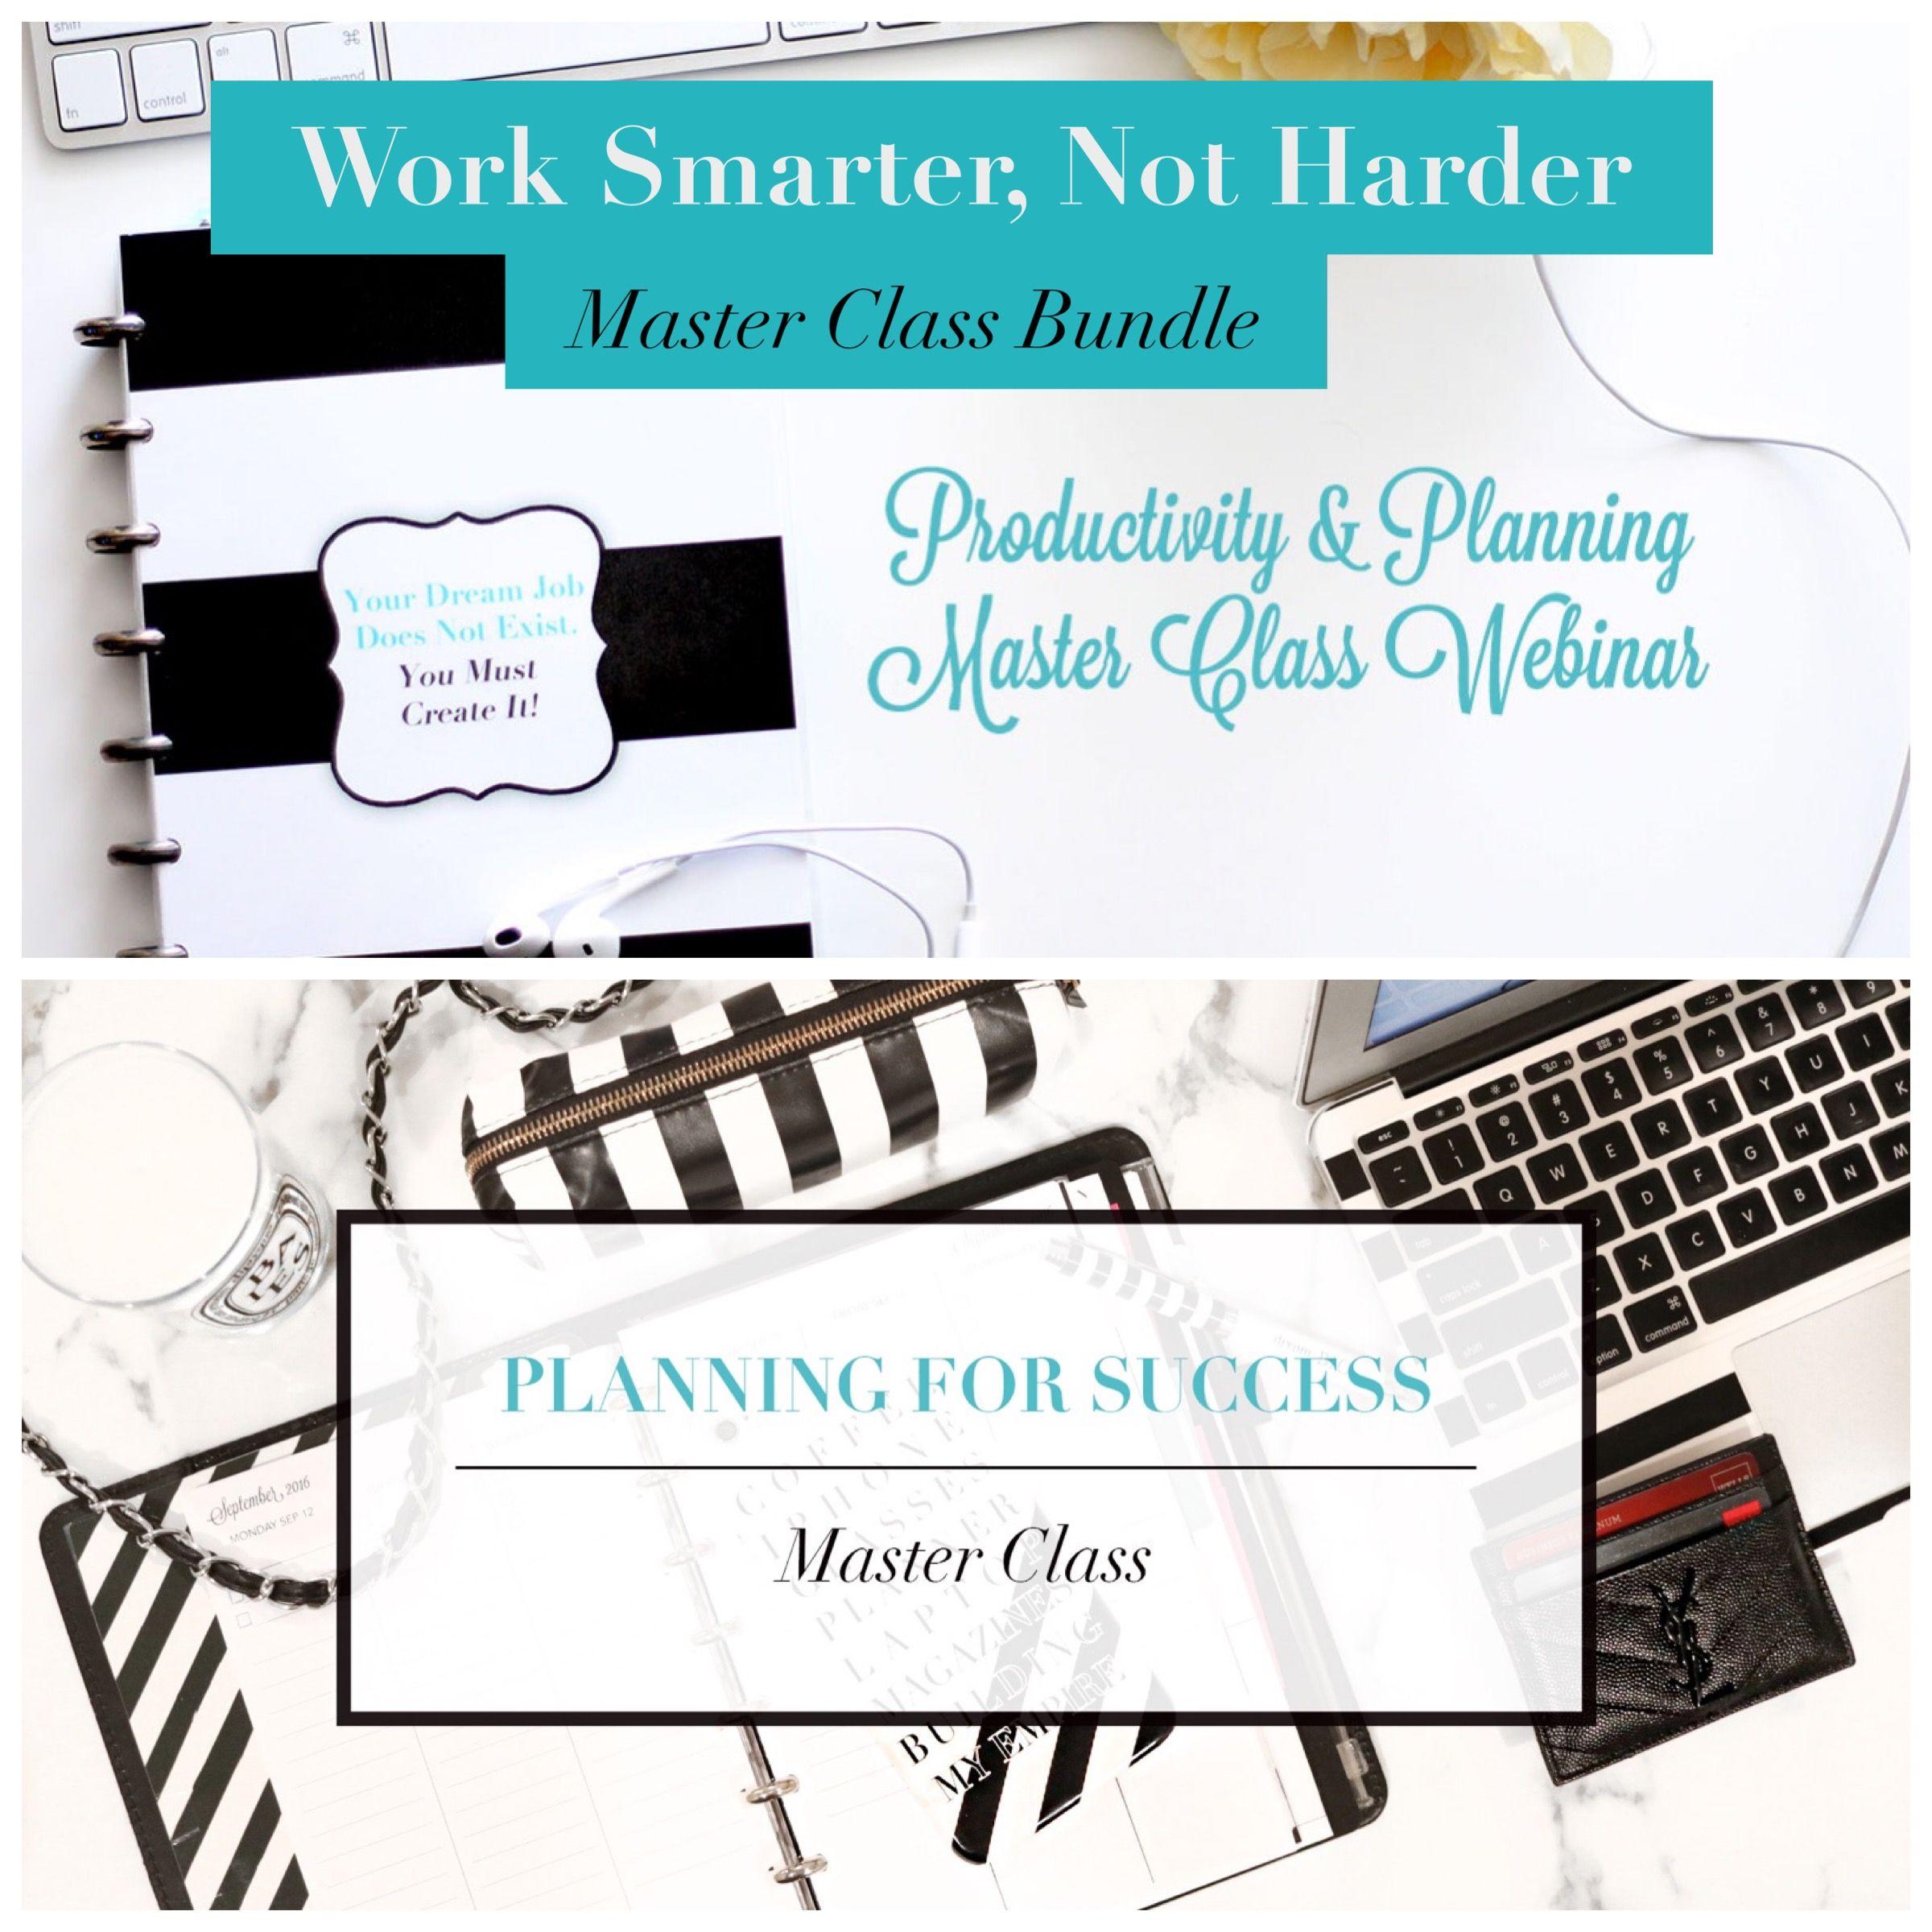 Work Smarter Not Harder Master Class Bundle